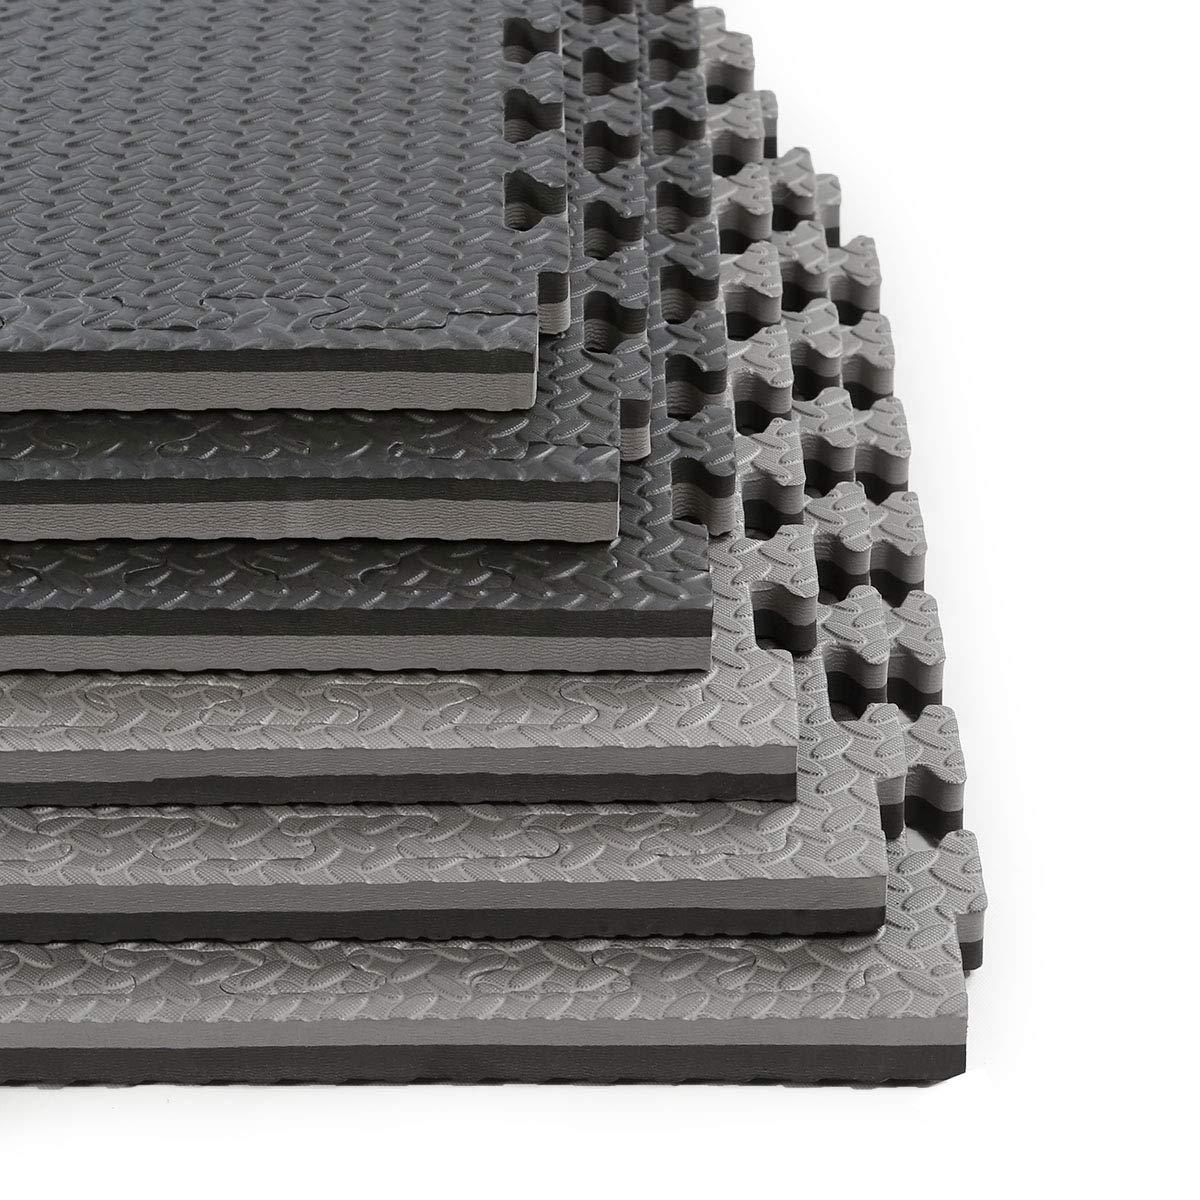 Clevr 1'' Thick EVA Exericse Mat | Reversible and Interlocking Gym Foam Floor Mat Tiles (24'' x 24'') | Protective Flooring | Steel Pattern | 12 Pcs, 48 sqft | 1 Year Limited Warranty | Black Grey